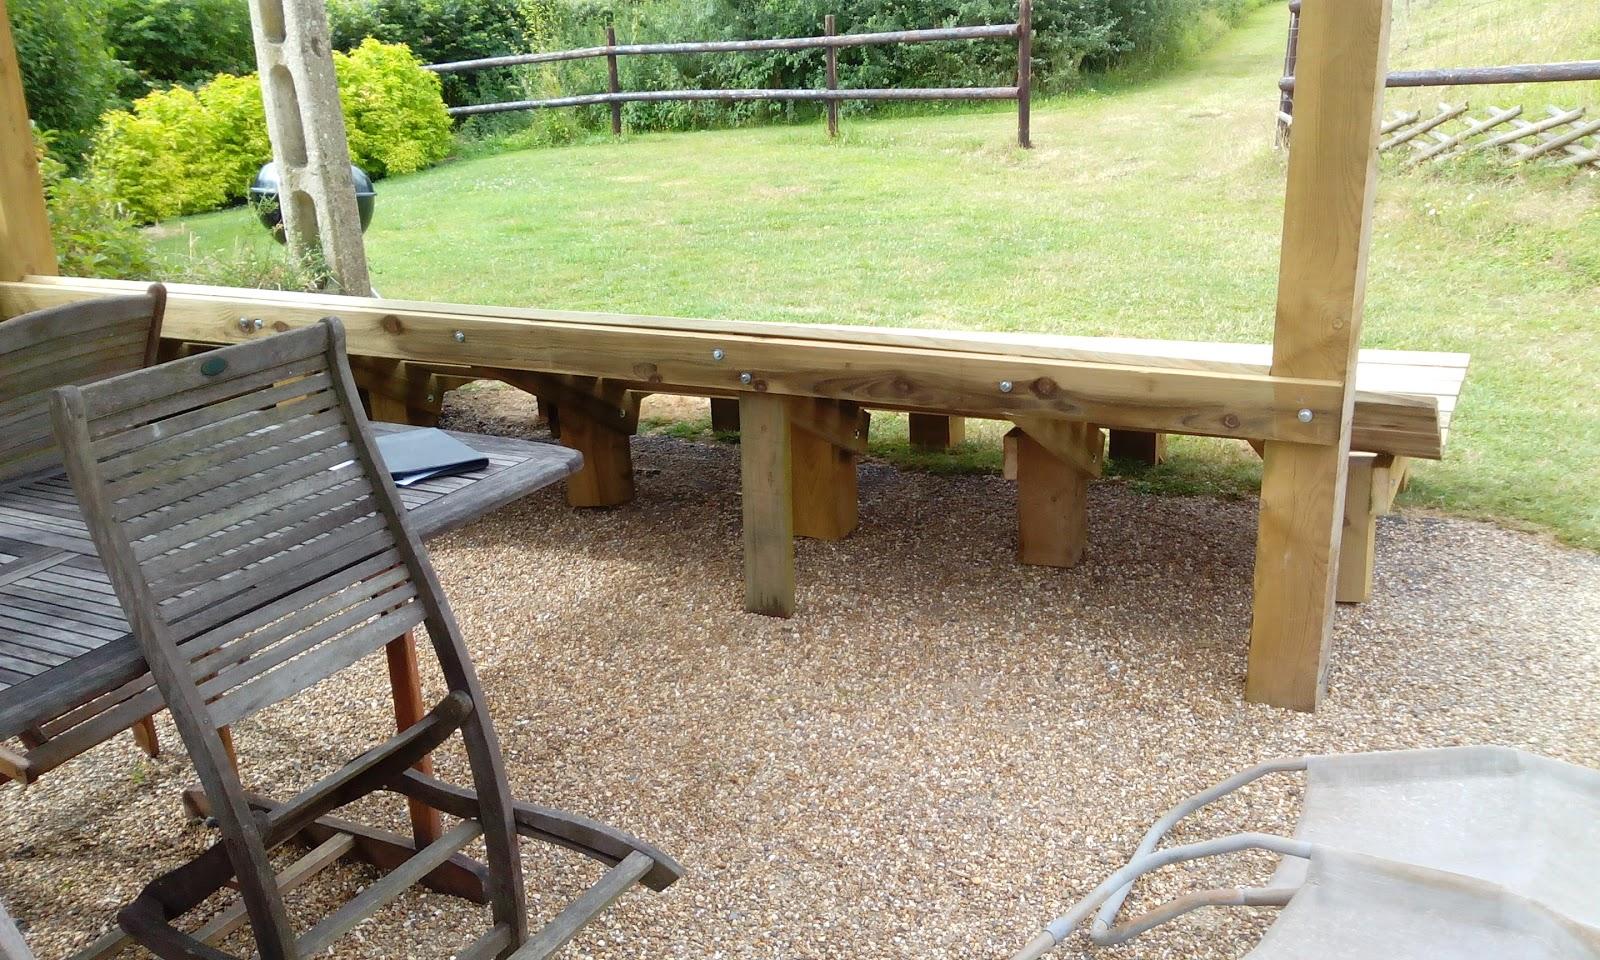 Domaine du martinaa elevage gourmandise jardinage et for Fabriquer une chaise